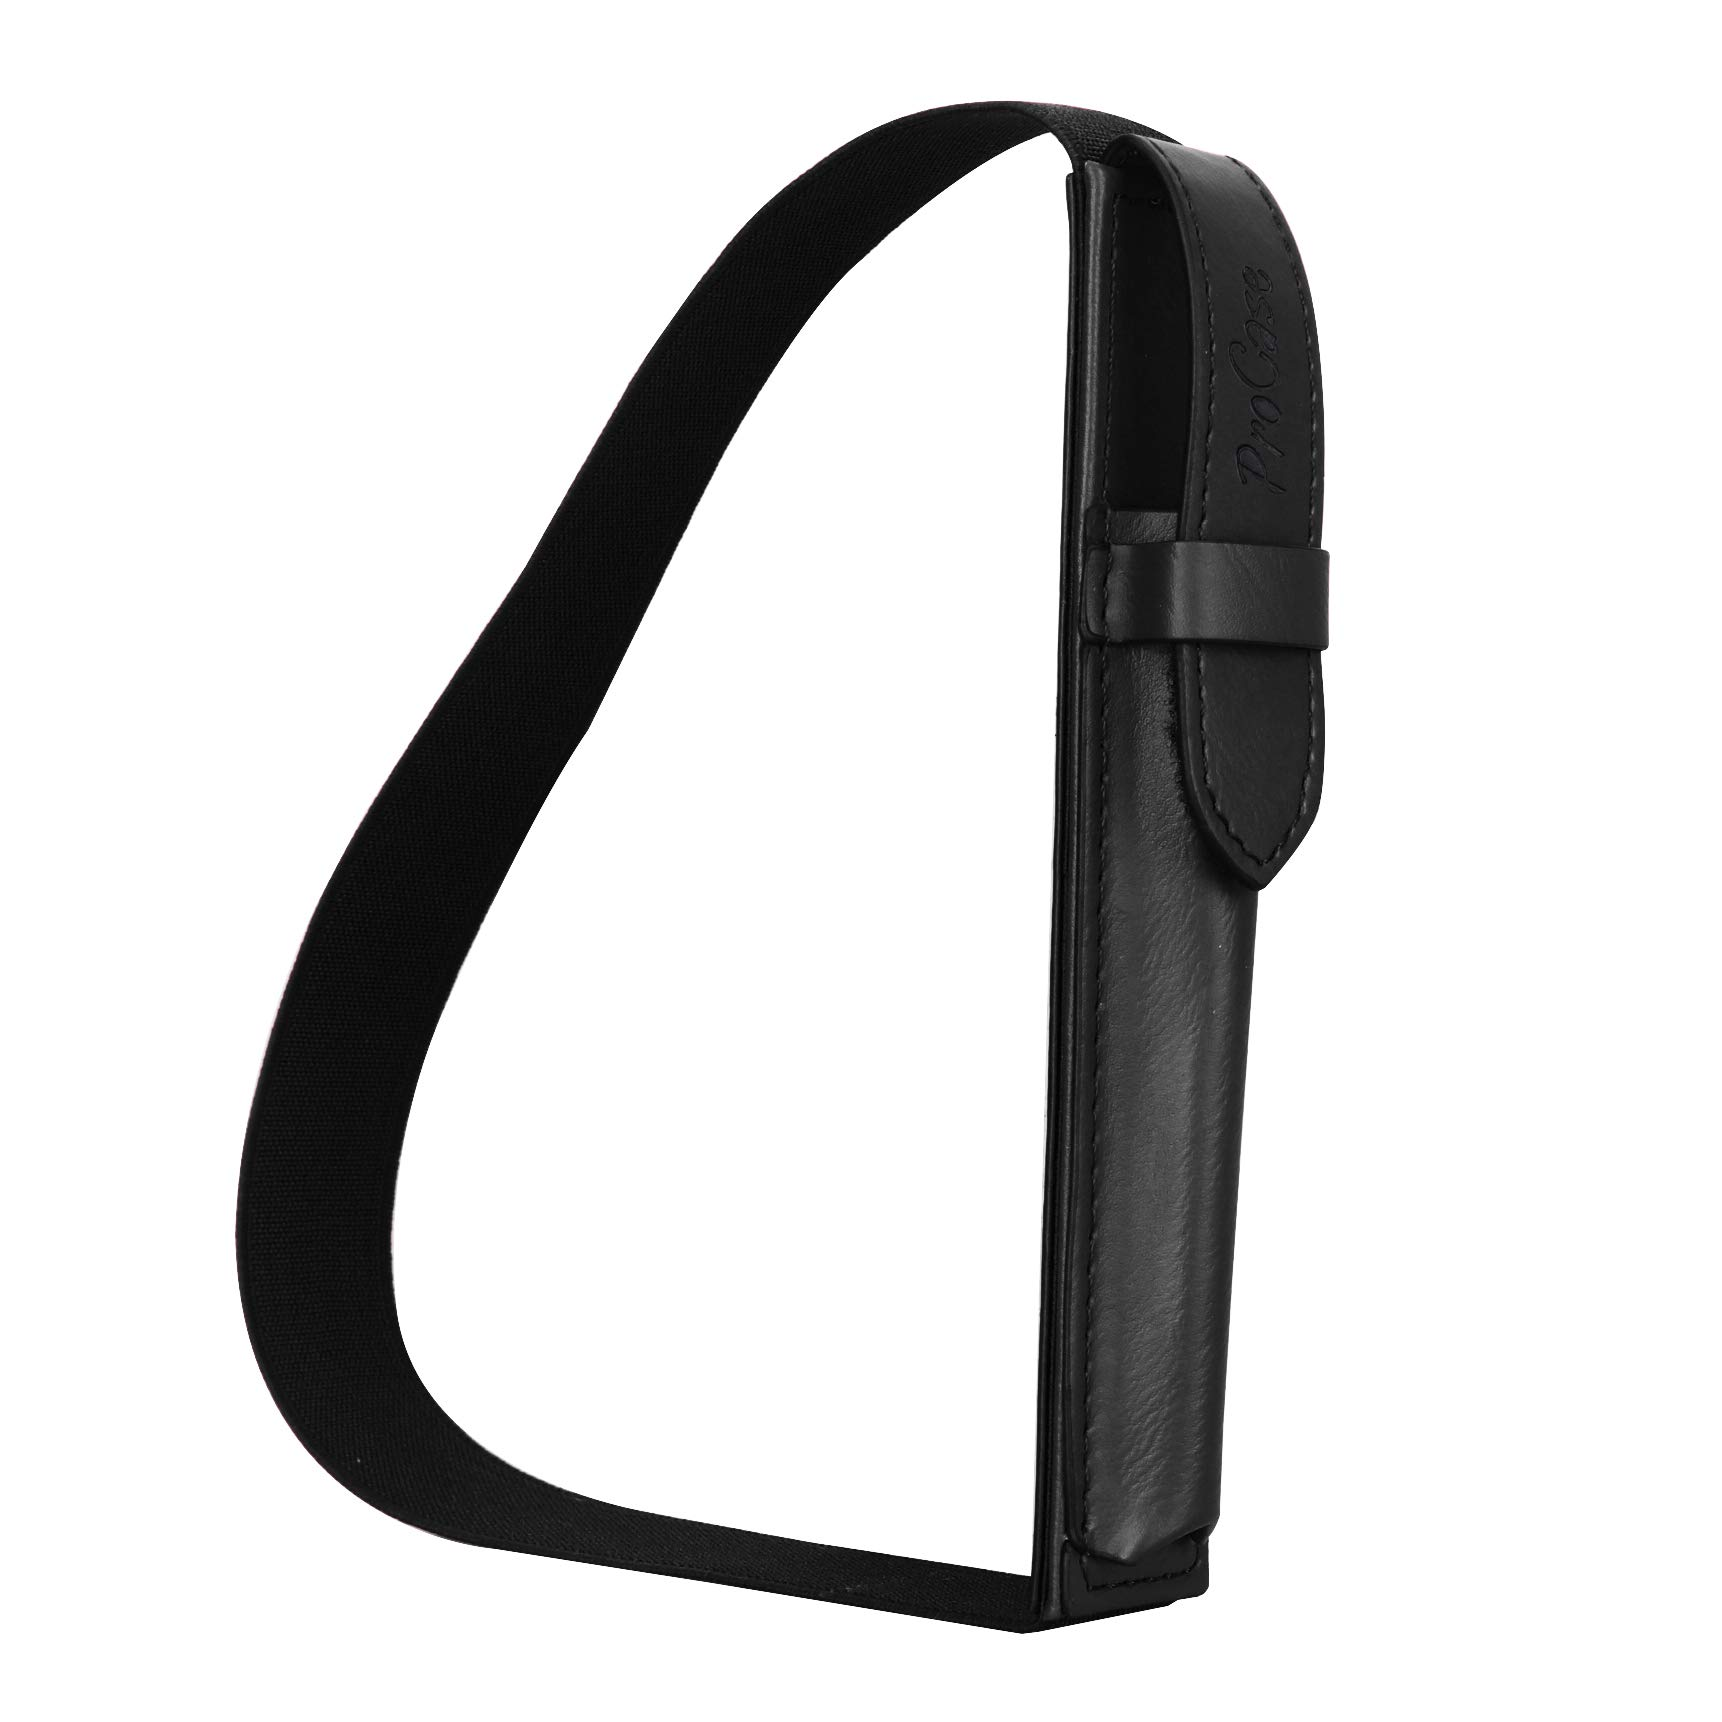 ProCase S Pen Holder for S Pen, Elastic Pencil Pocket Sleeve Detachable Pouch Bag Cover Compatible with Galaxy Tab A 10.5 (SM-T590 T595 T597), Galaxy Tab S4 10.5 (SM-T830 T835 T837) –Black